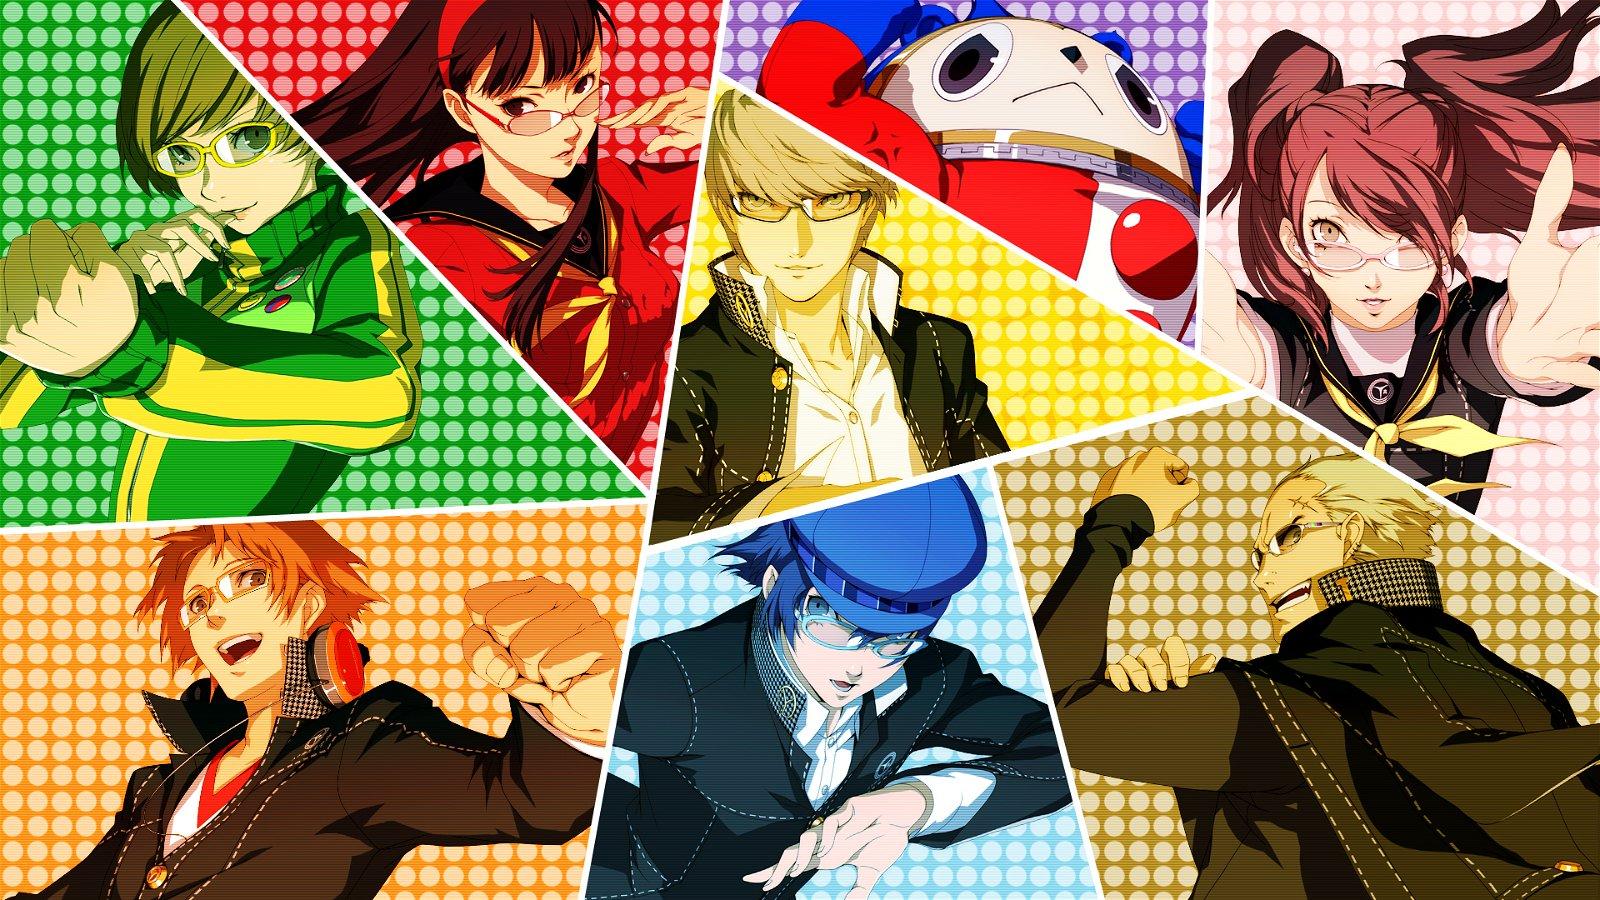 Persona 4 Golden (PS Vita) Review 6